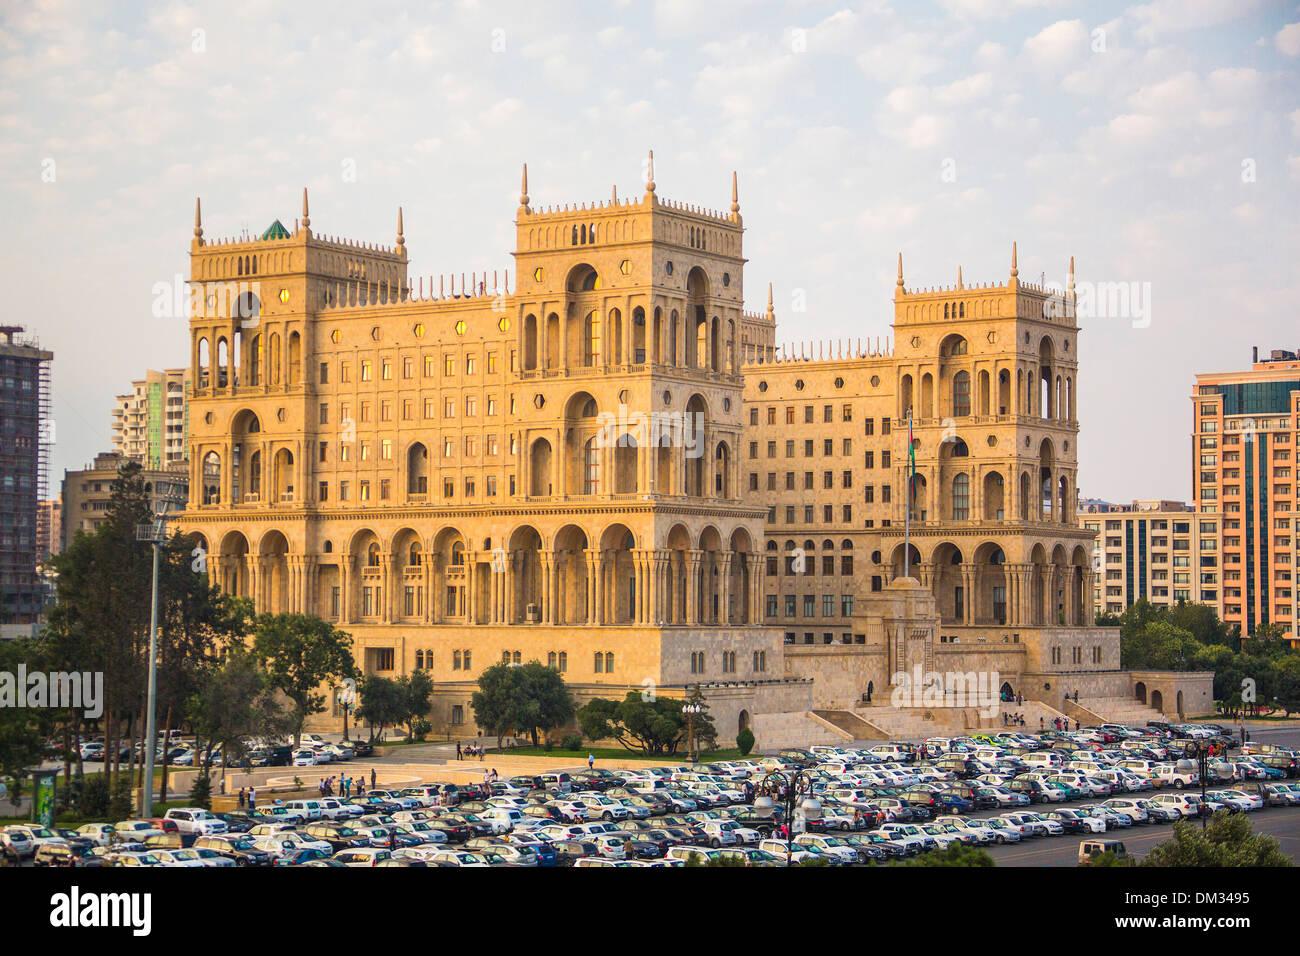 Azerbaijan, Caucasus, Eurasia, Baku, Government, administration, architecture, city, house, sunset, travel, cars - Stock Image